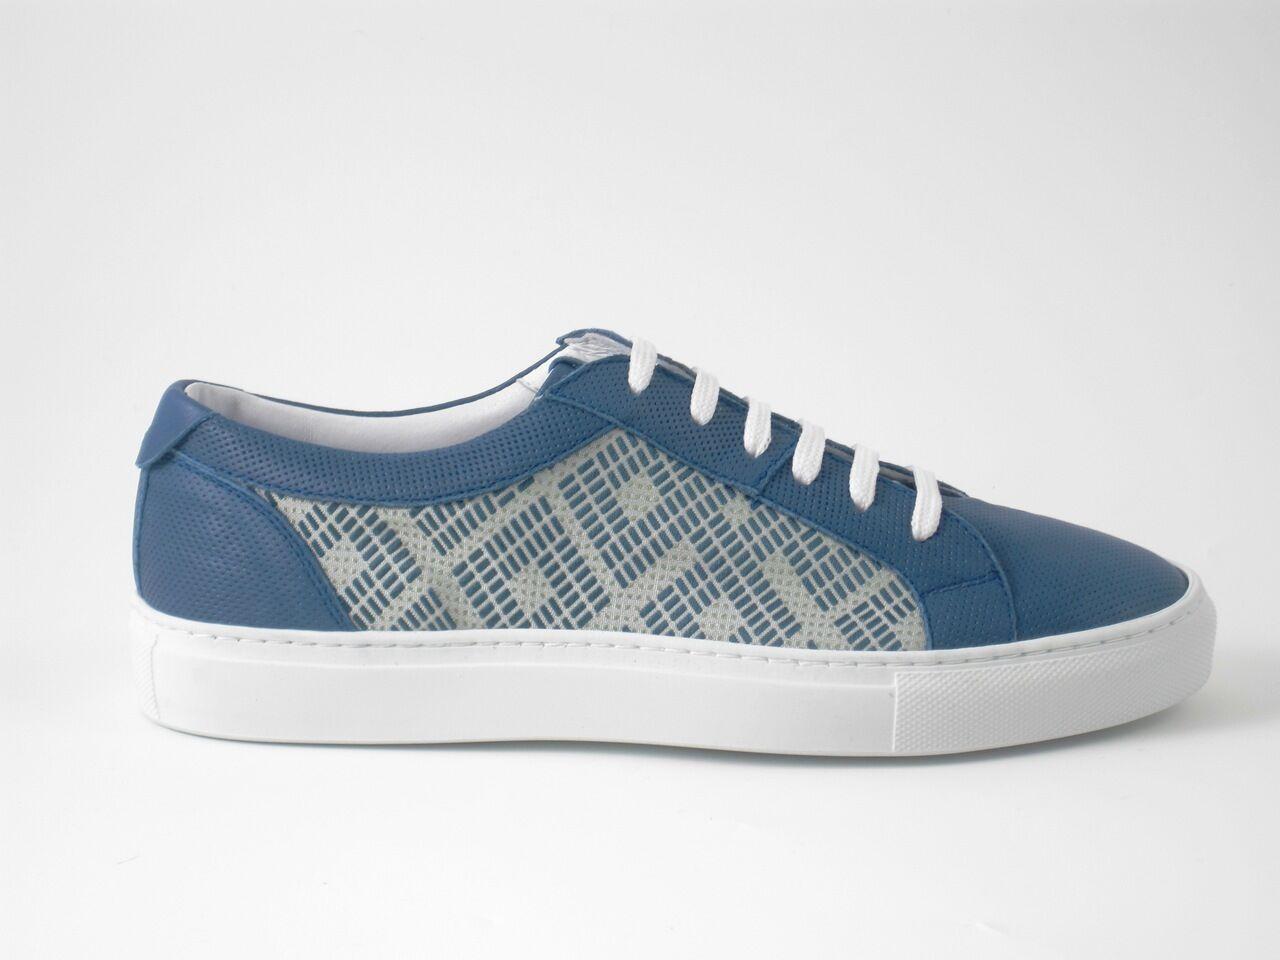 Schuhe Herren Sneaker Turnschuhe Blau Muster Gr 40 Made in Italy